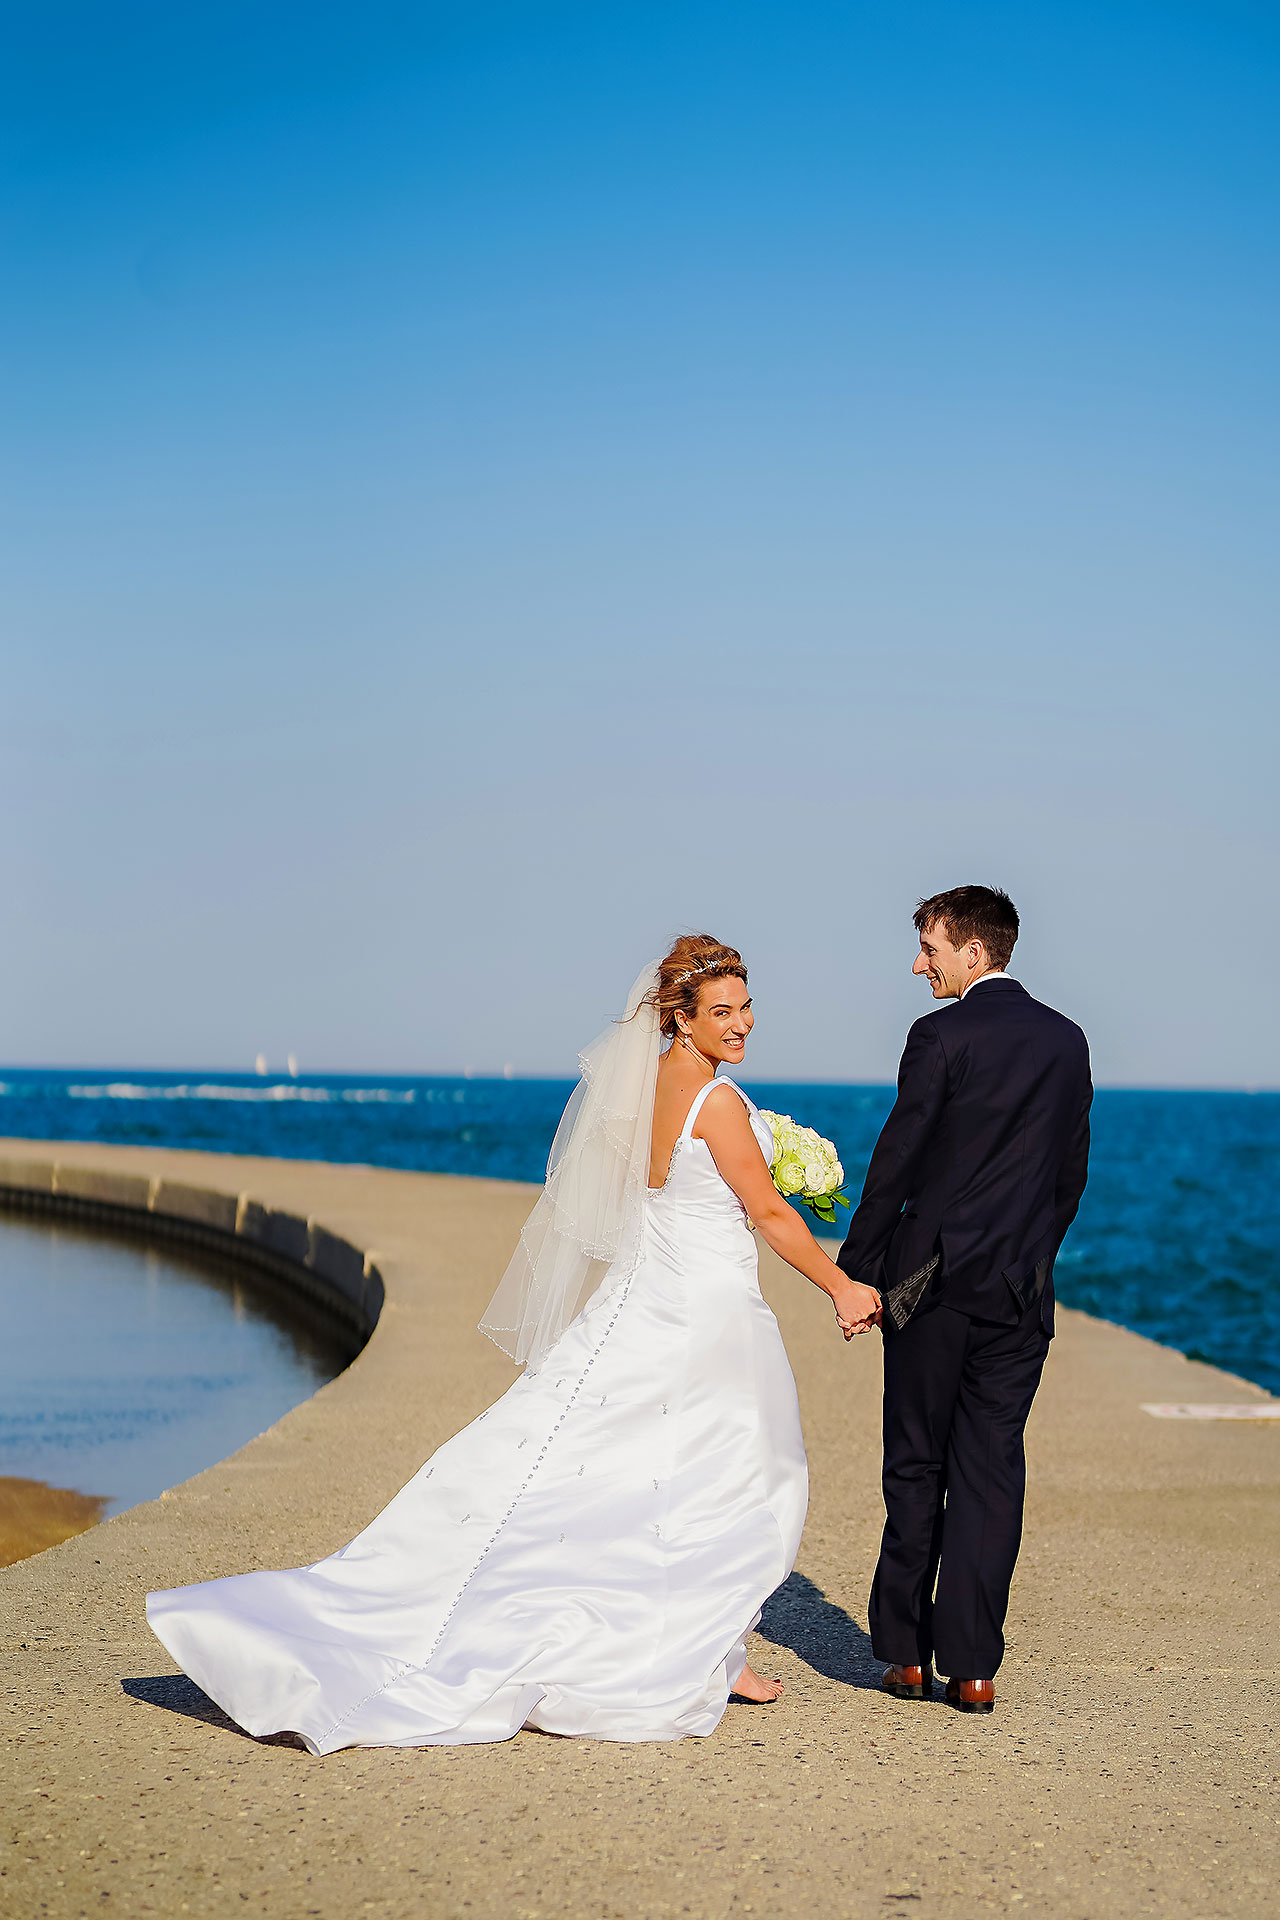 Jaclyn Matt Odessy Chicago River Cruise Wedding 099